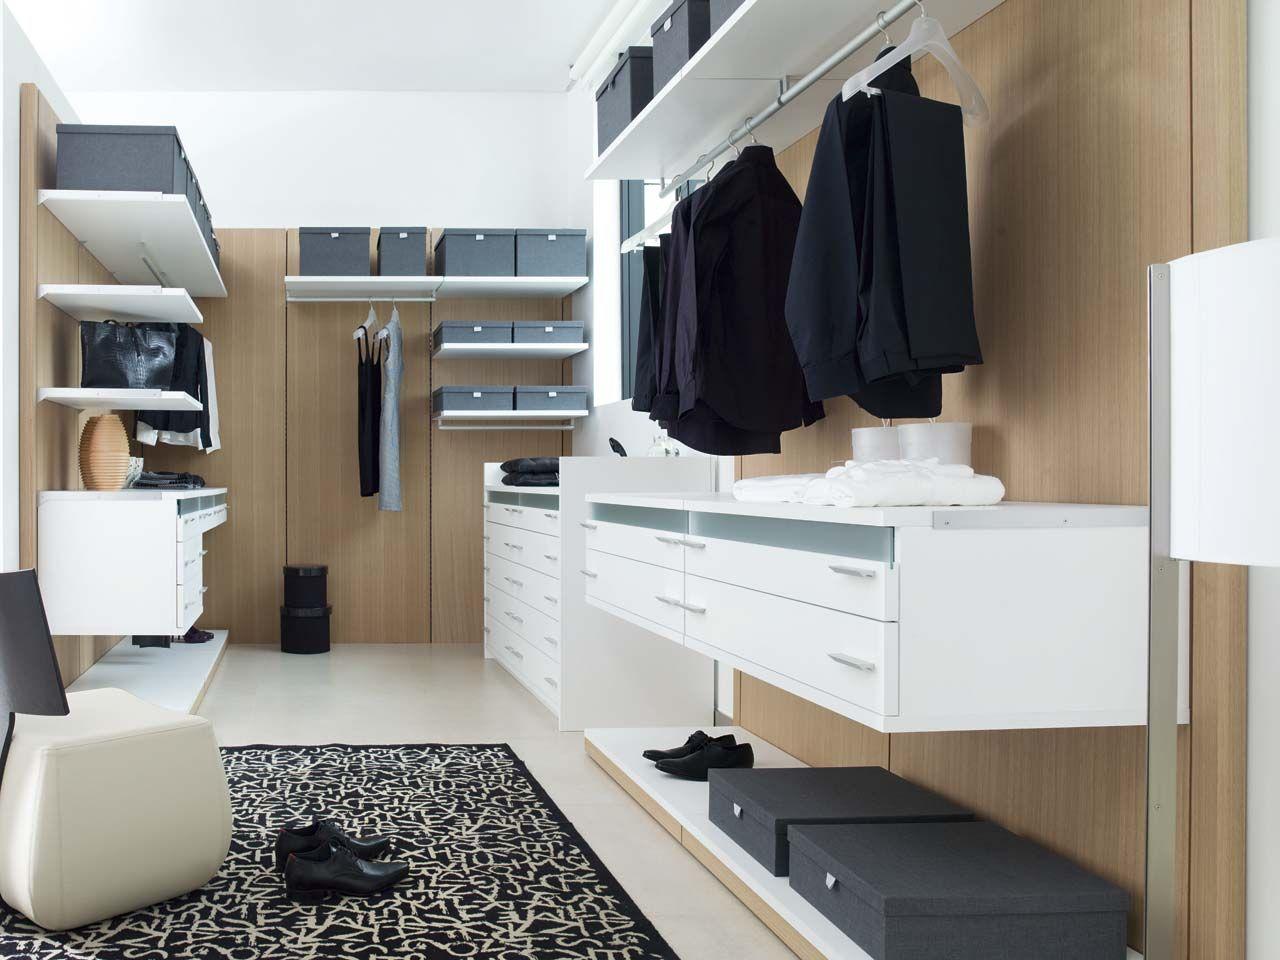 vestidor abierto porcelanosa natura roble blanco cal lino habana textil roble nature - Vestidor Abierto